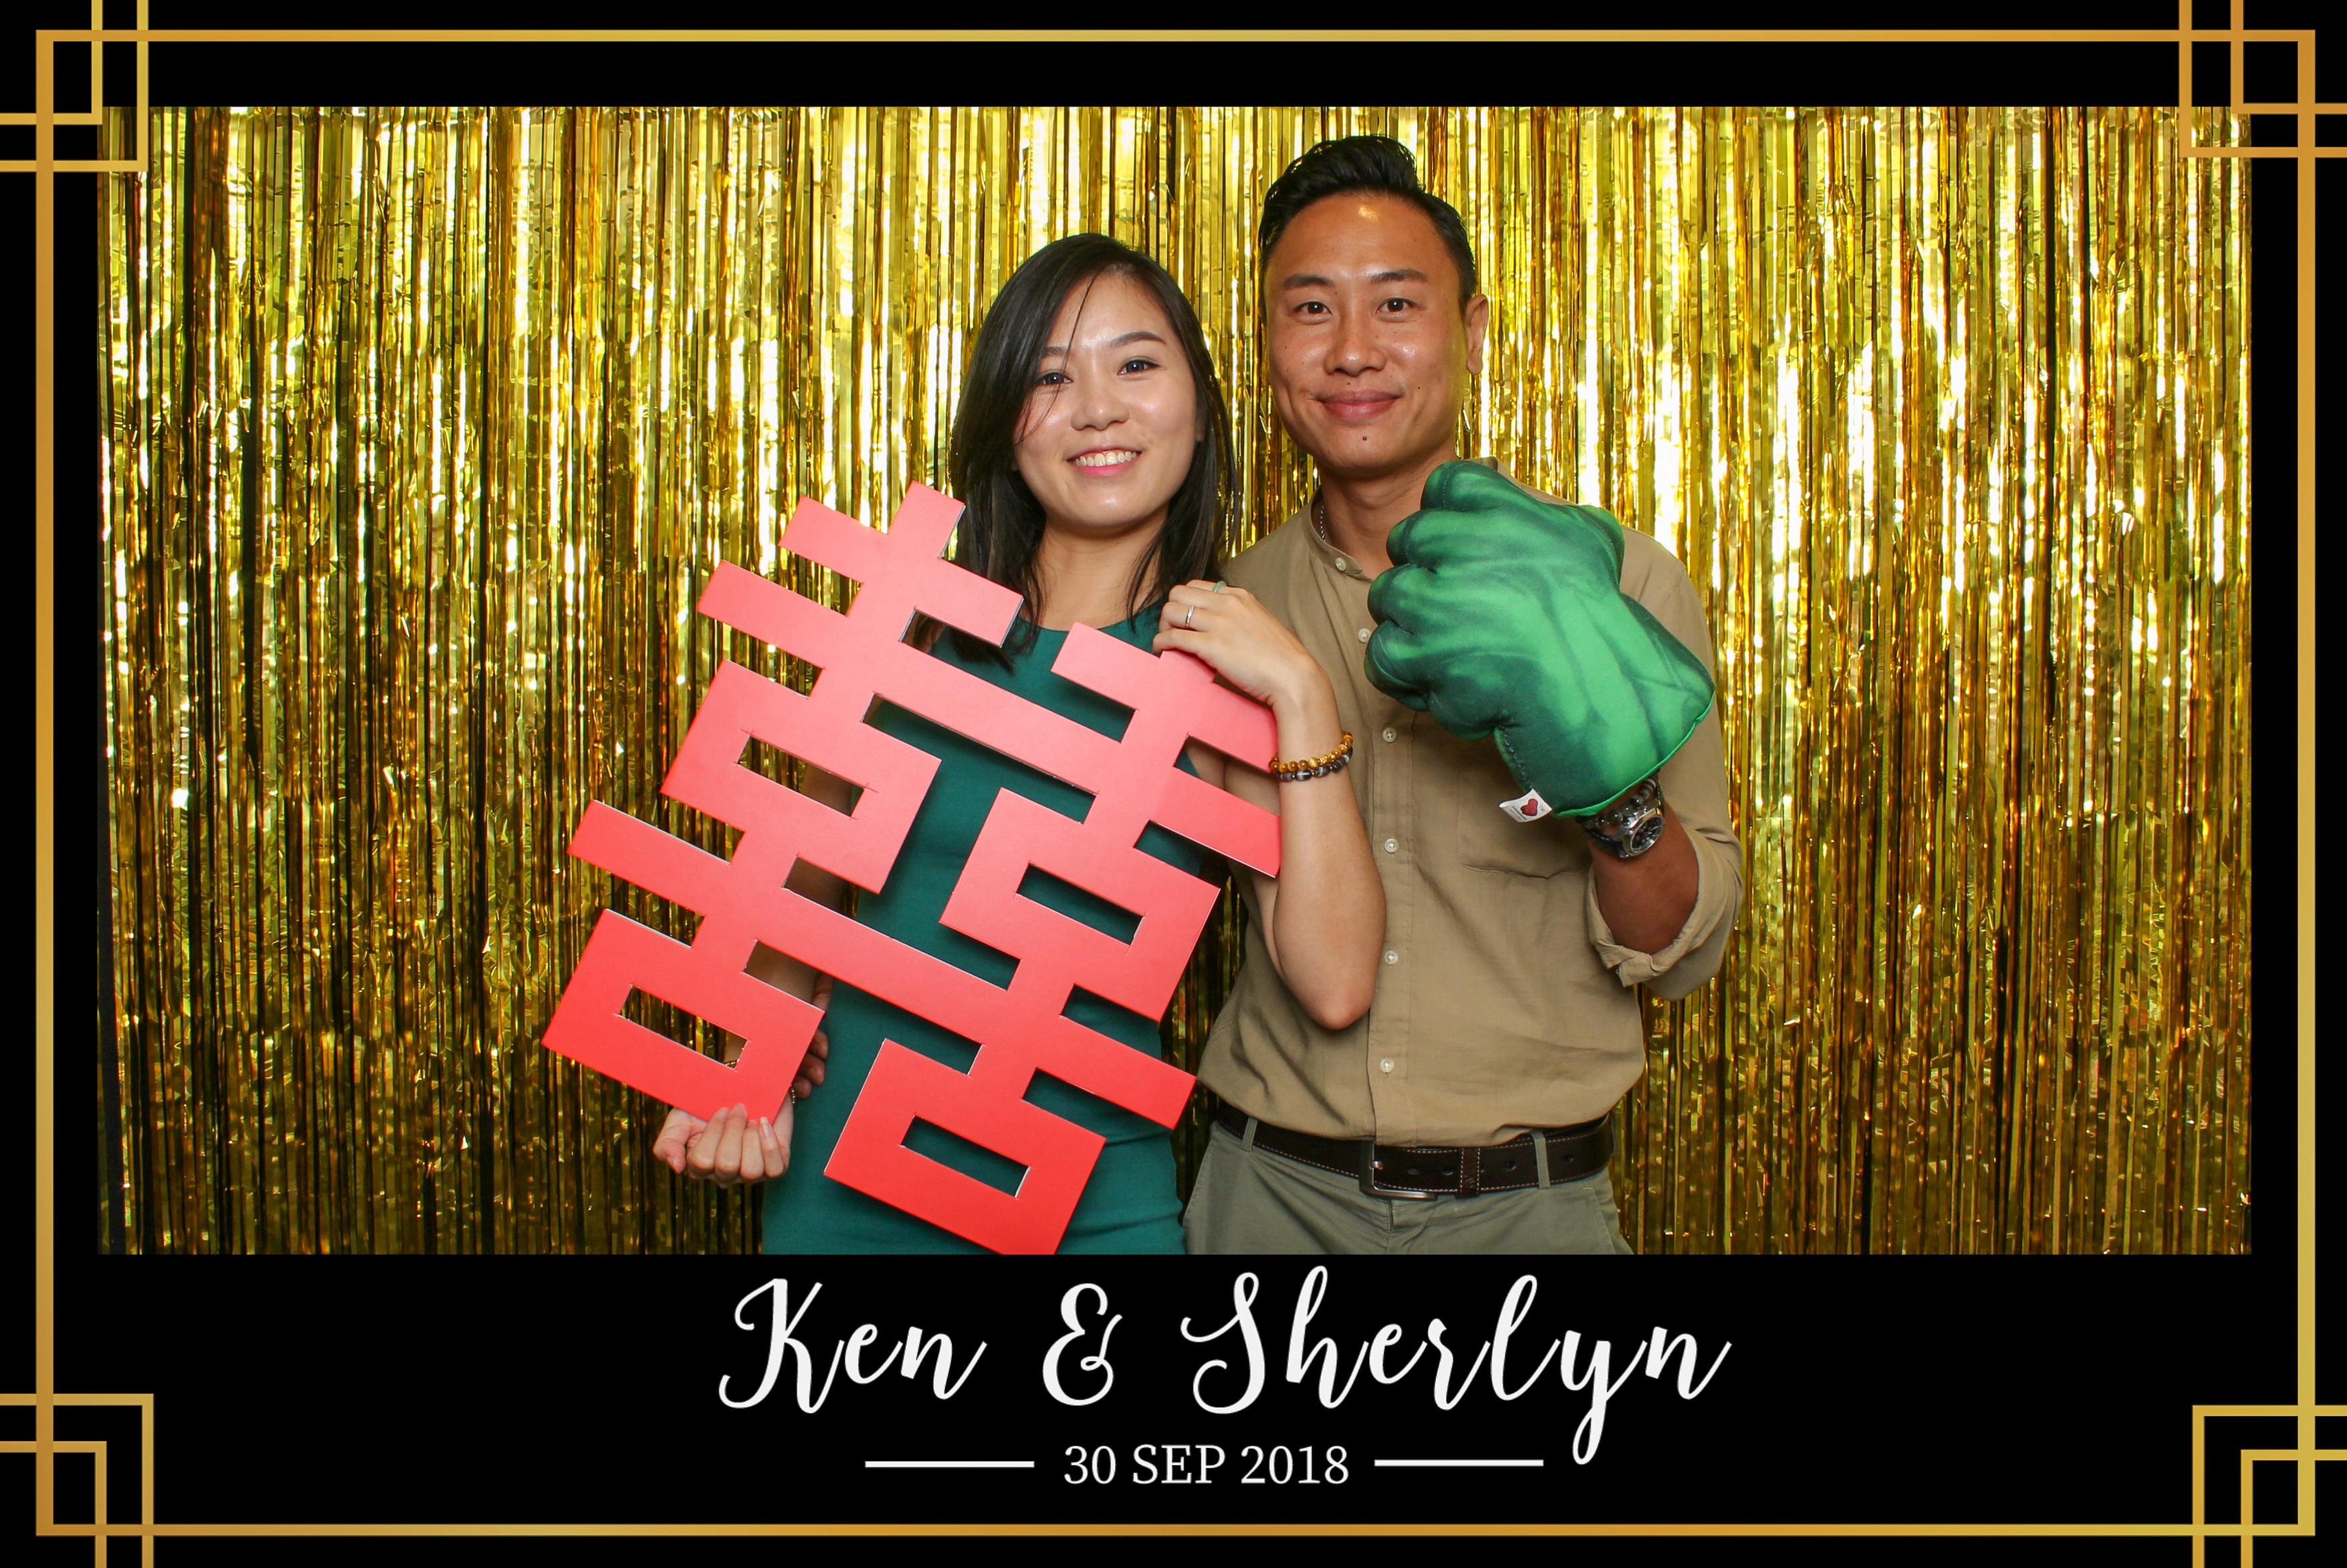 Ken Sherlyn wedding photo booth (38)